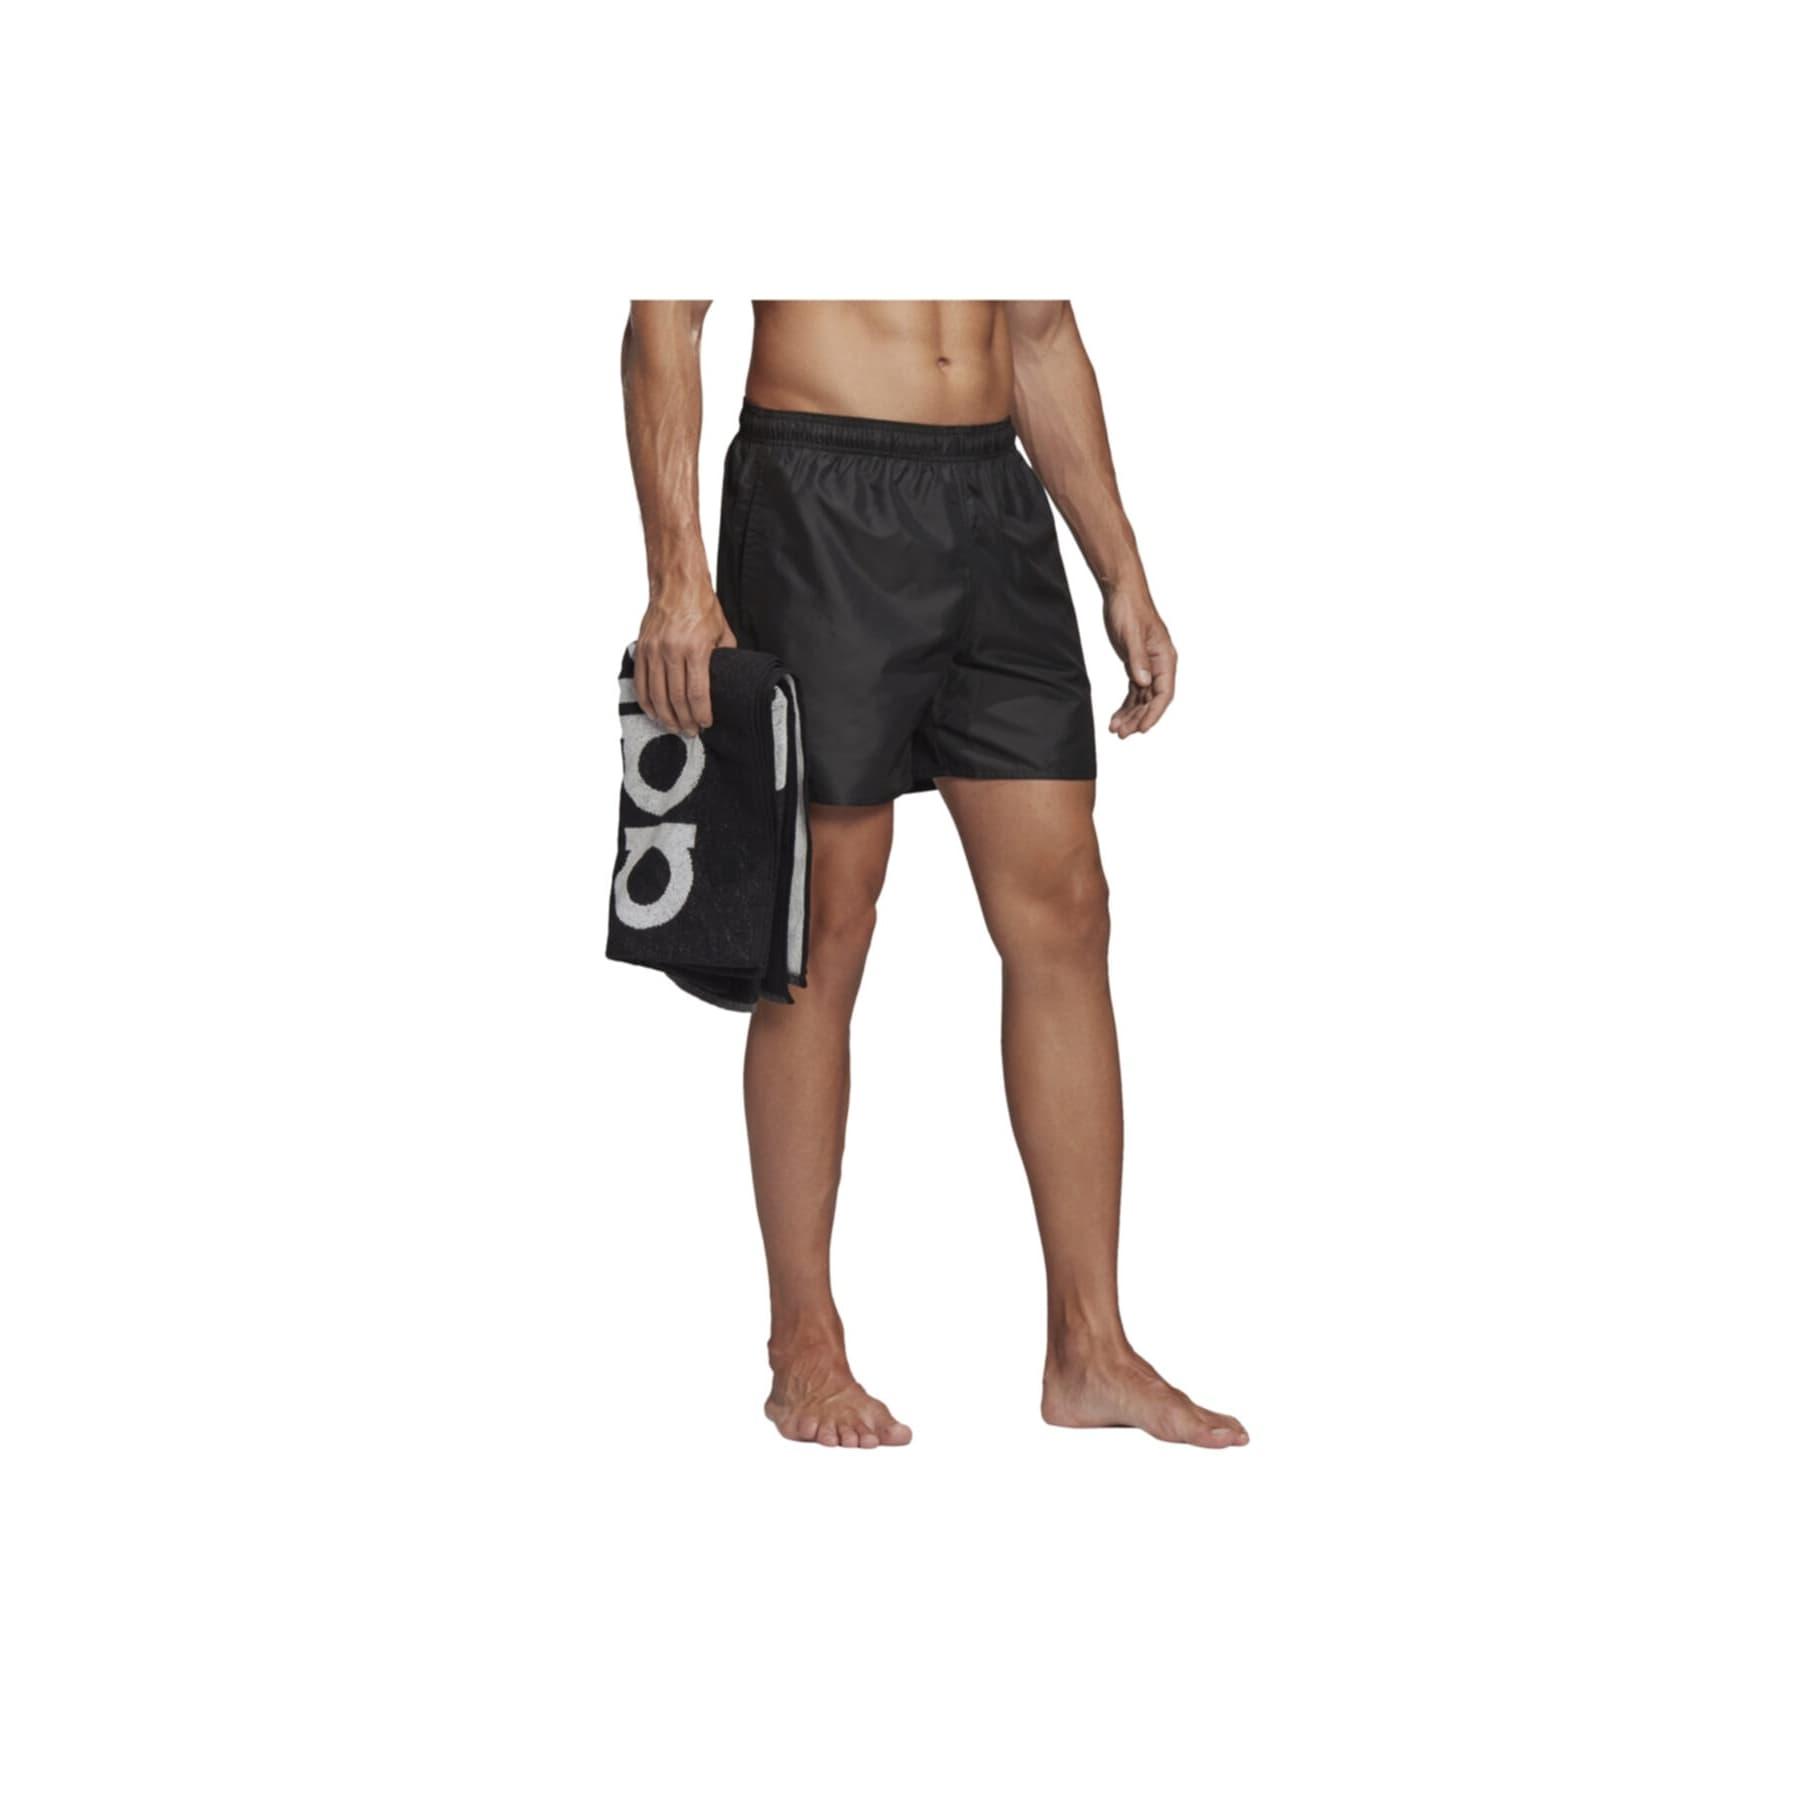 CLX Solid Erkek Siyah Şort Mayo (FJ3379)